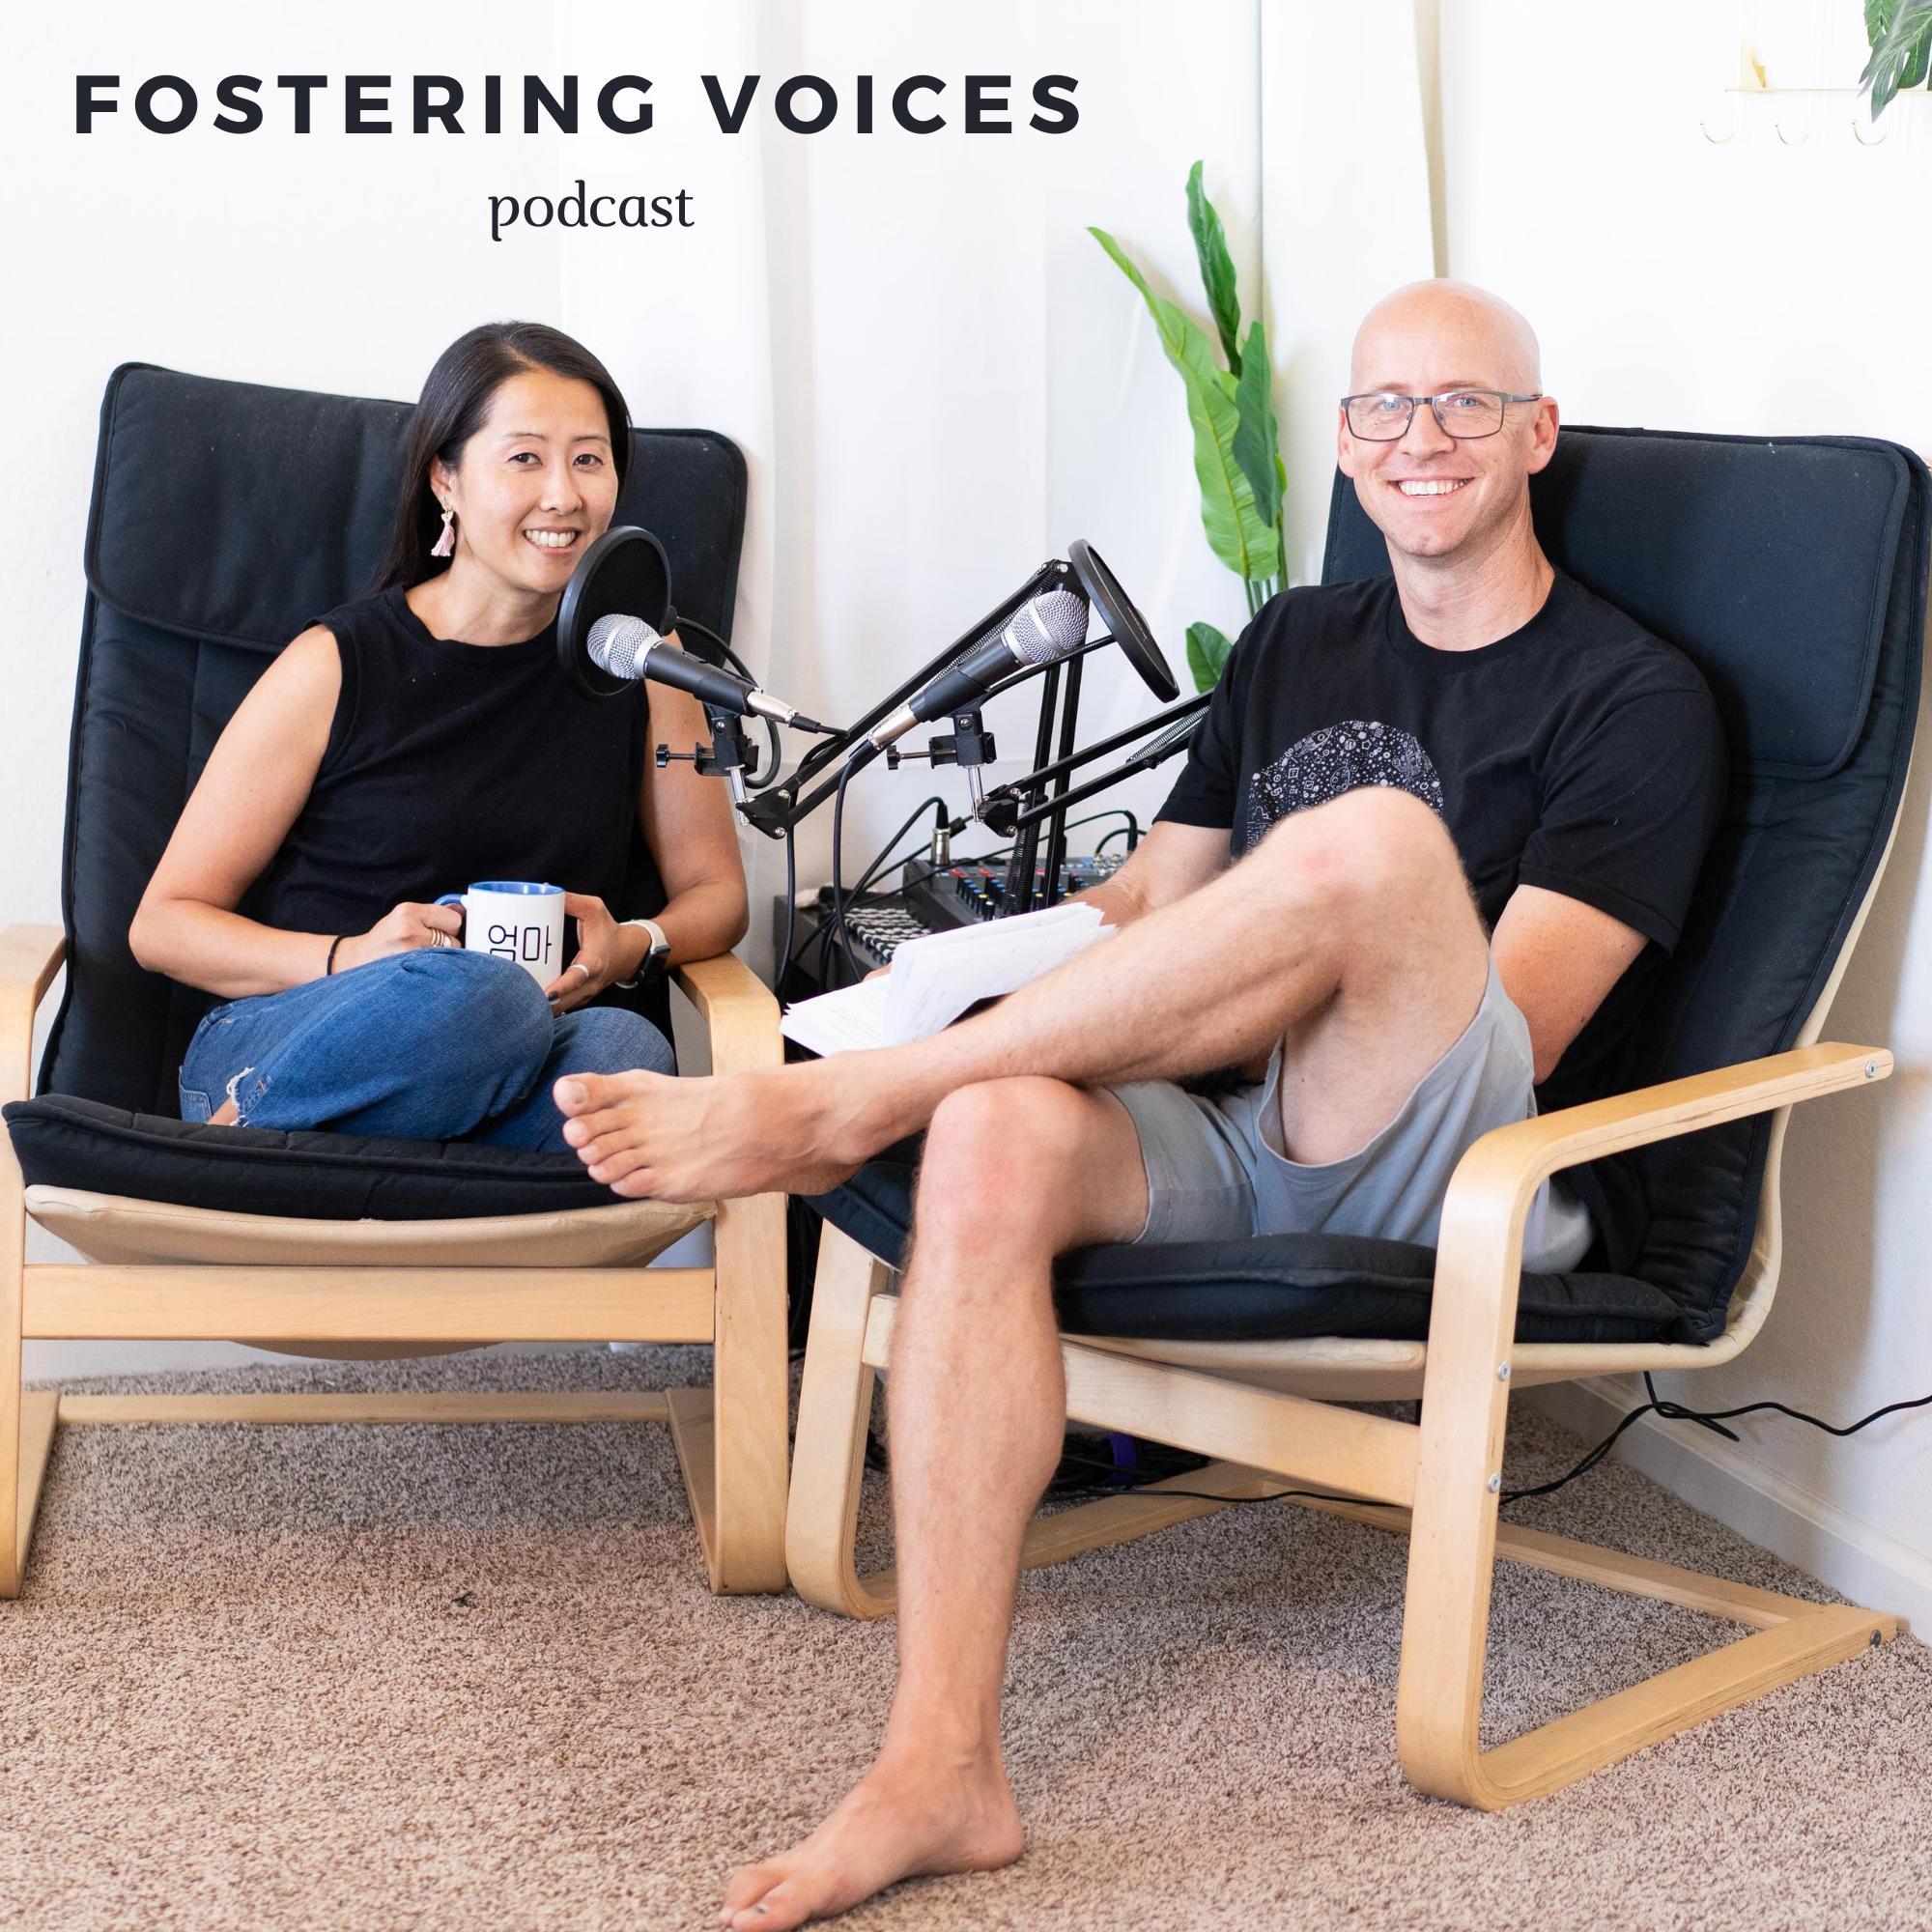 Episode 75: Fostering Love in North Carolina show art